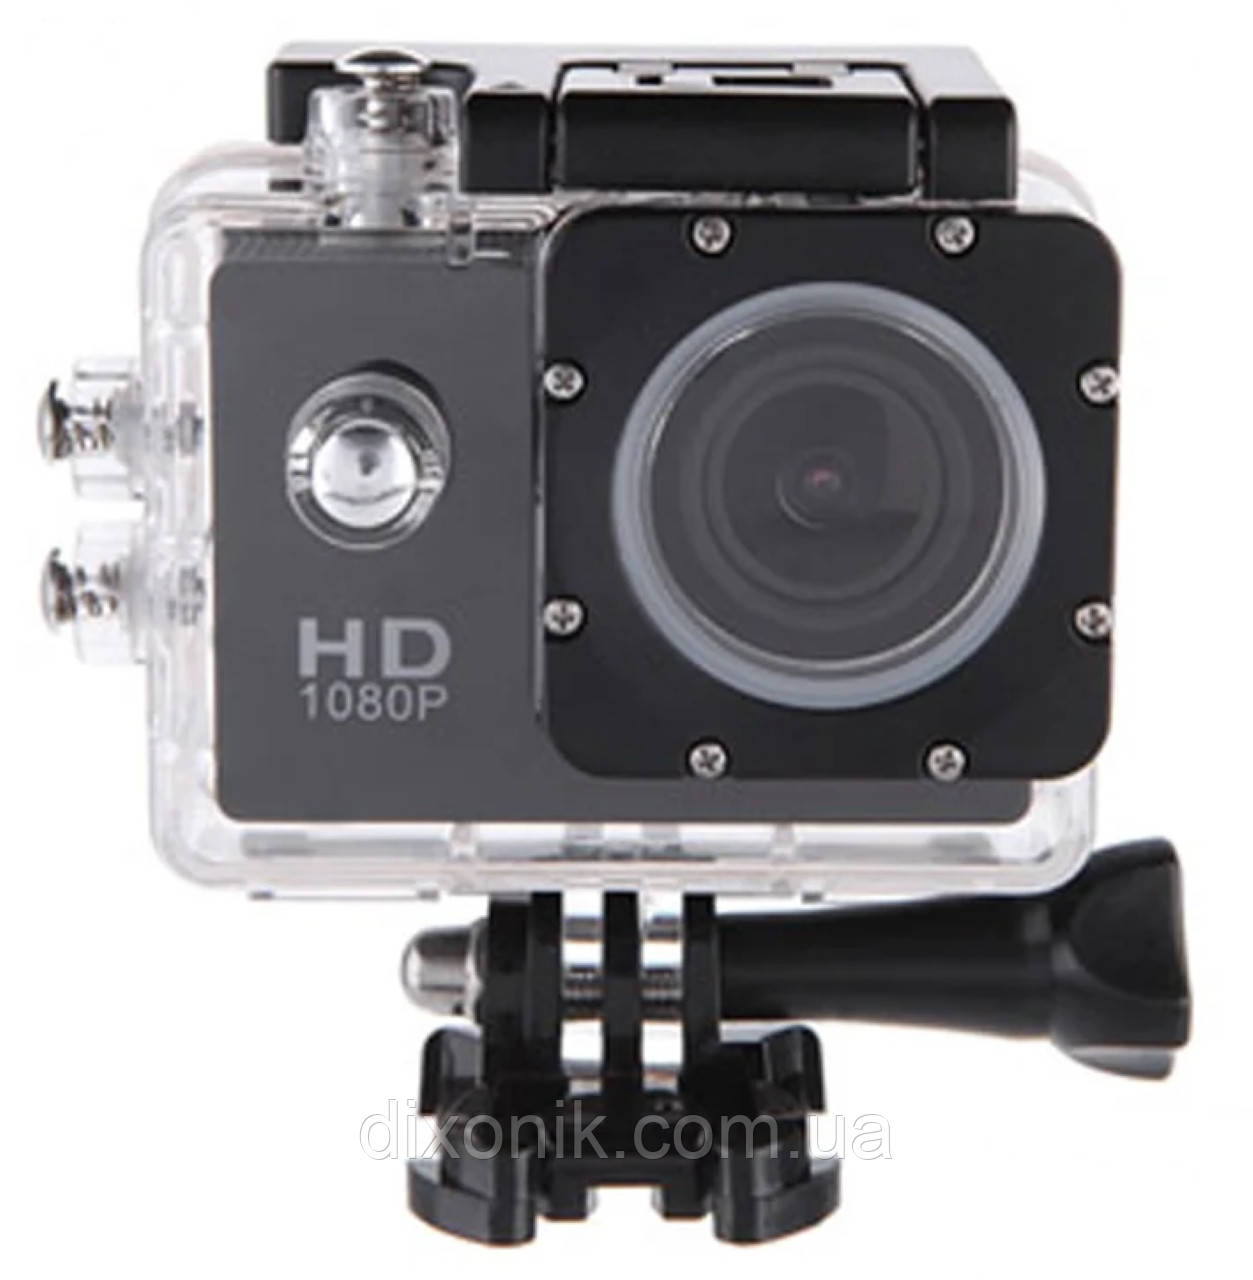 Водонепроницаемая Экшн камера Action Camera A9 Full HD для дайвинга